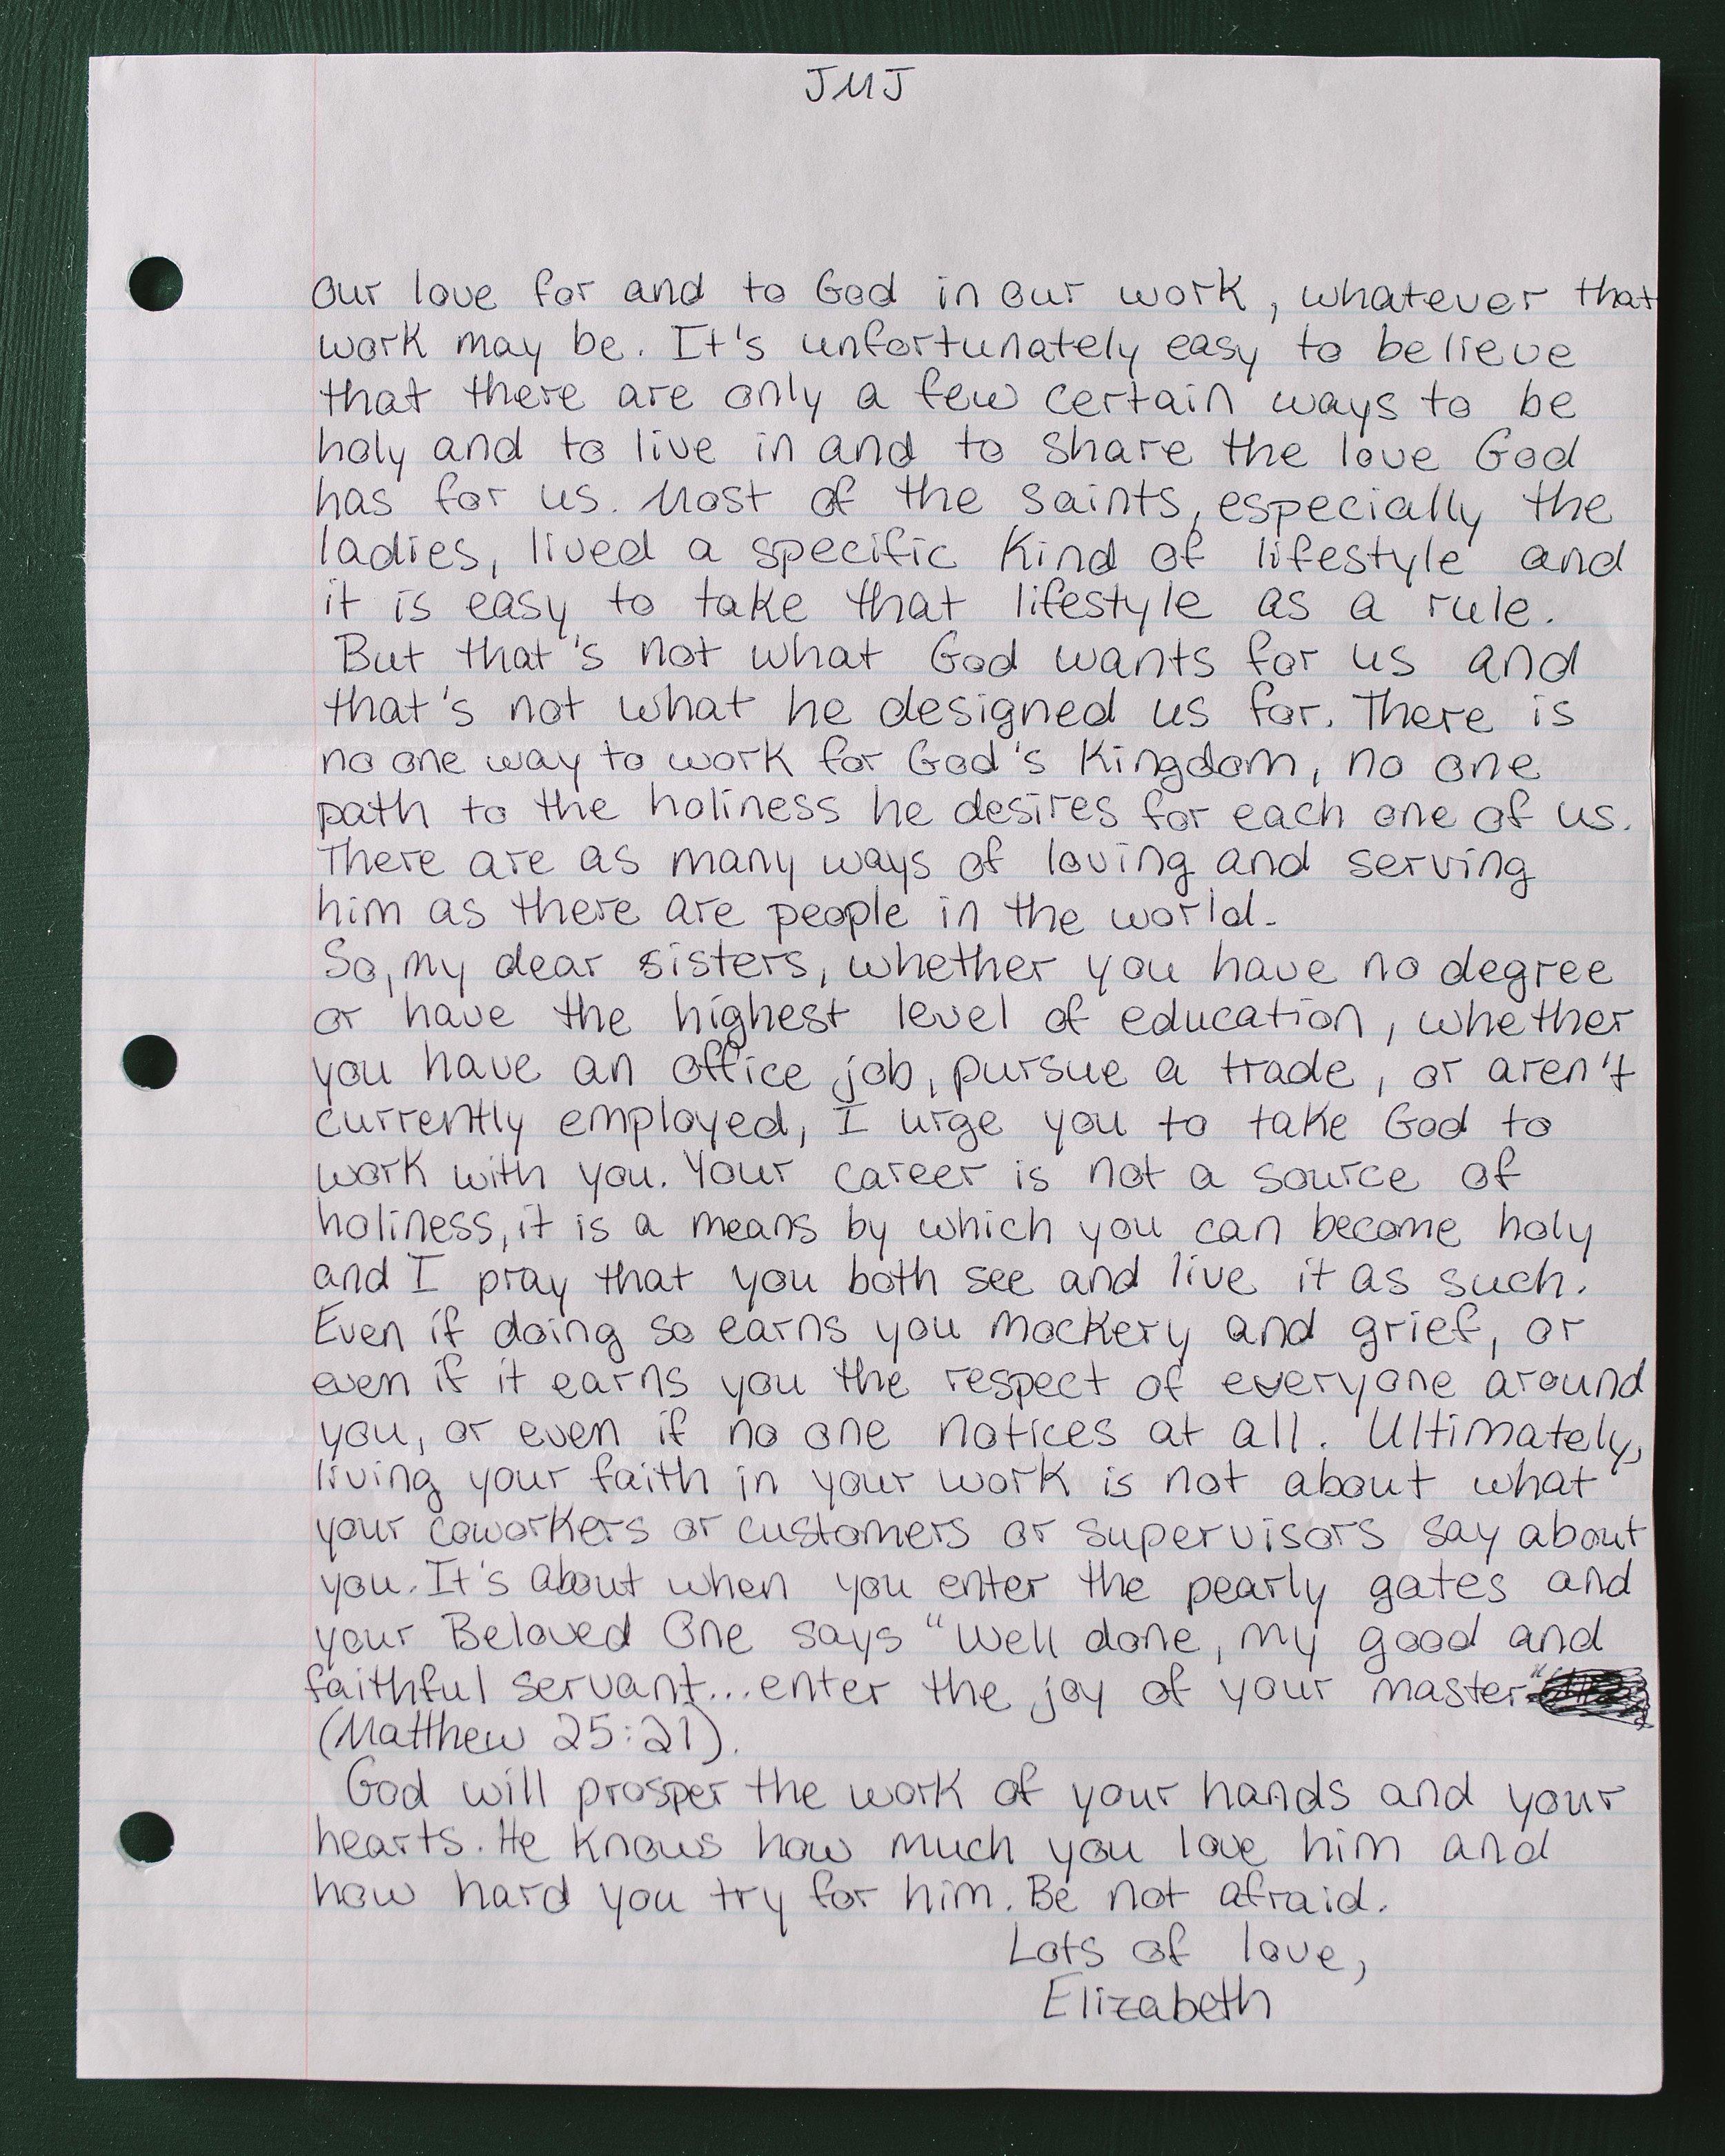 Elizabeth Hoyle Letter to Women 2